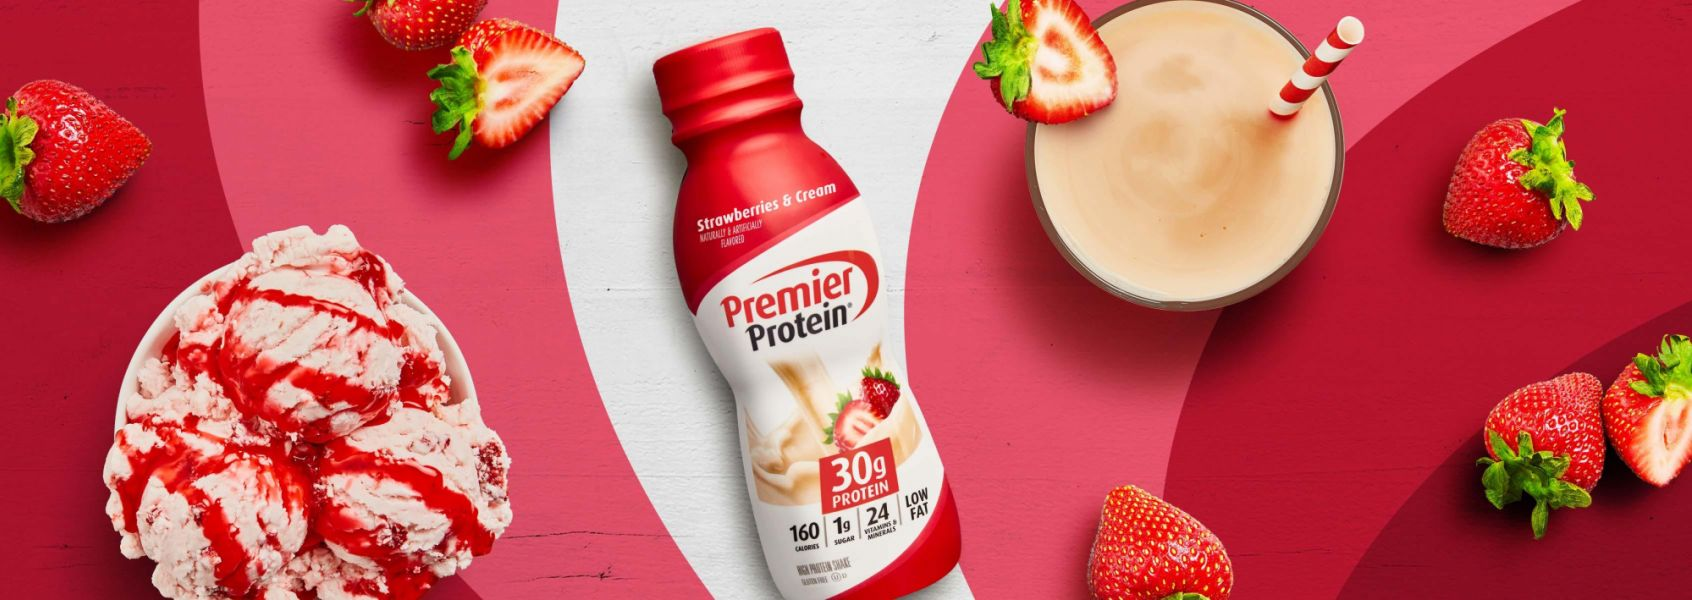 A photo of Premier Protein 11.5oz Strawberries & Cream Protein Shake